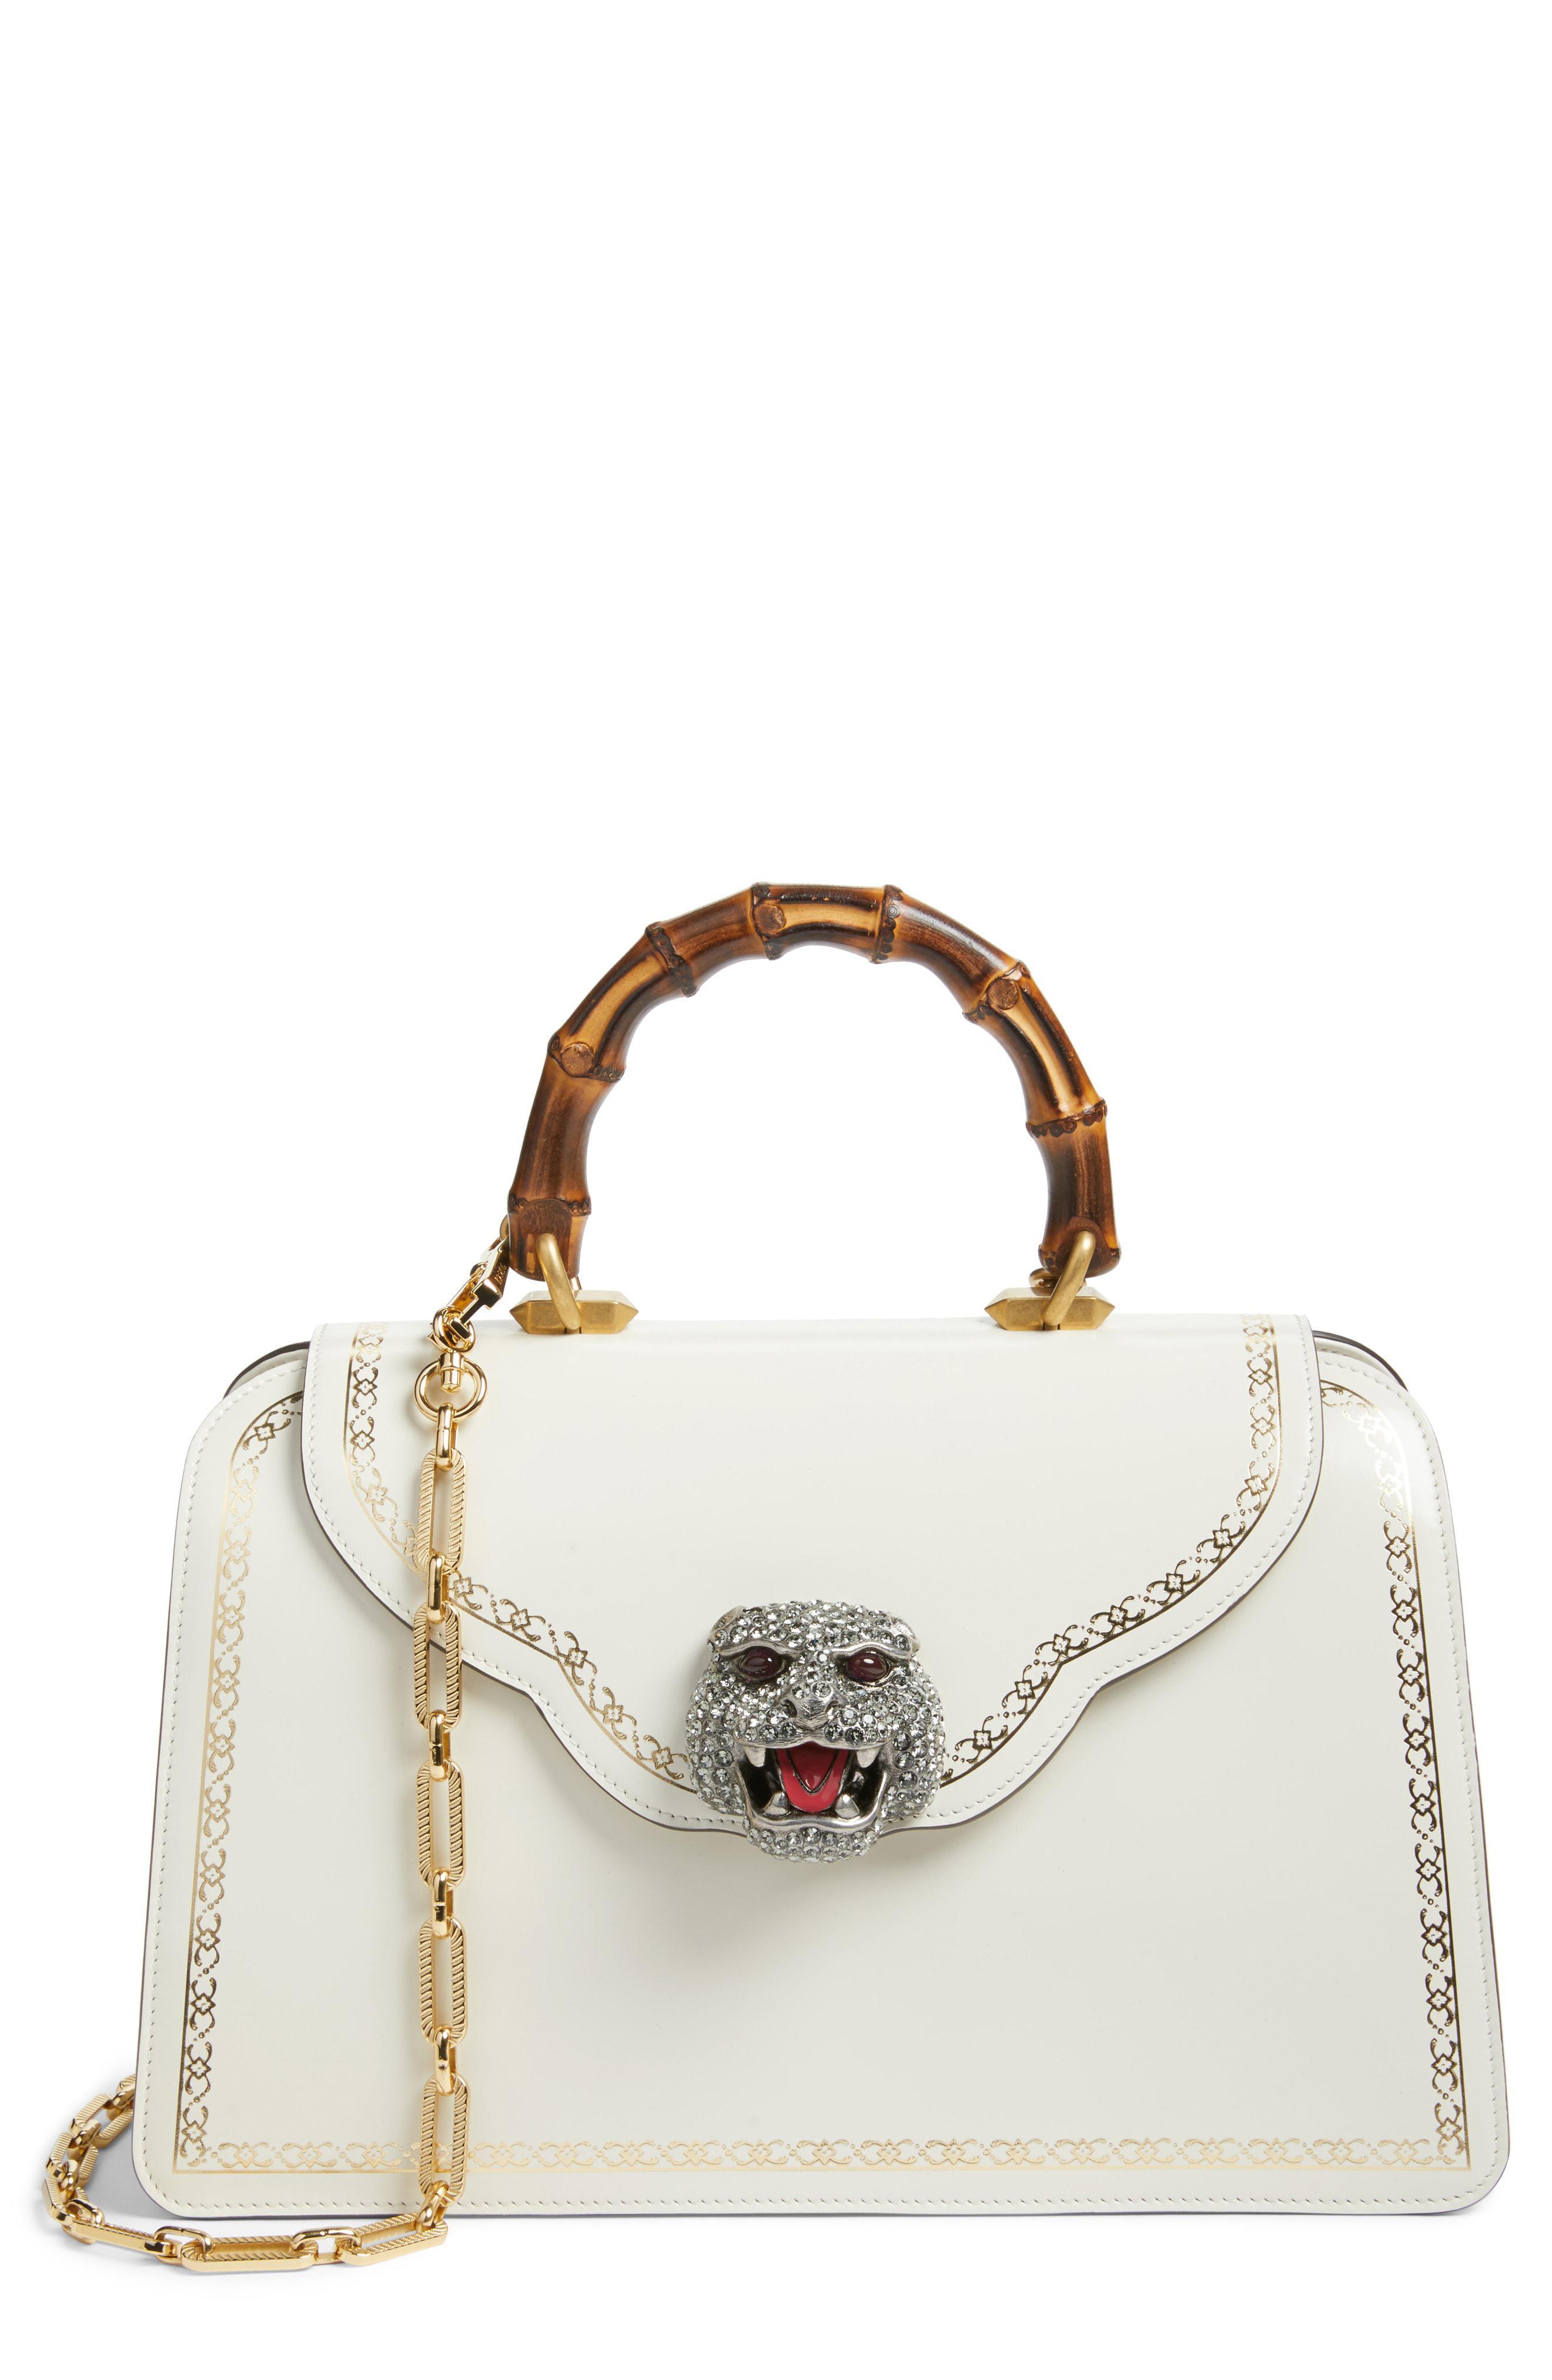 0923737b1a1 Lyst - Gucci Thiara Medium Leather Top Handle Bag in White